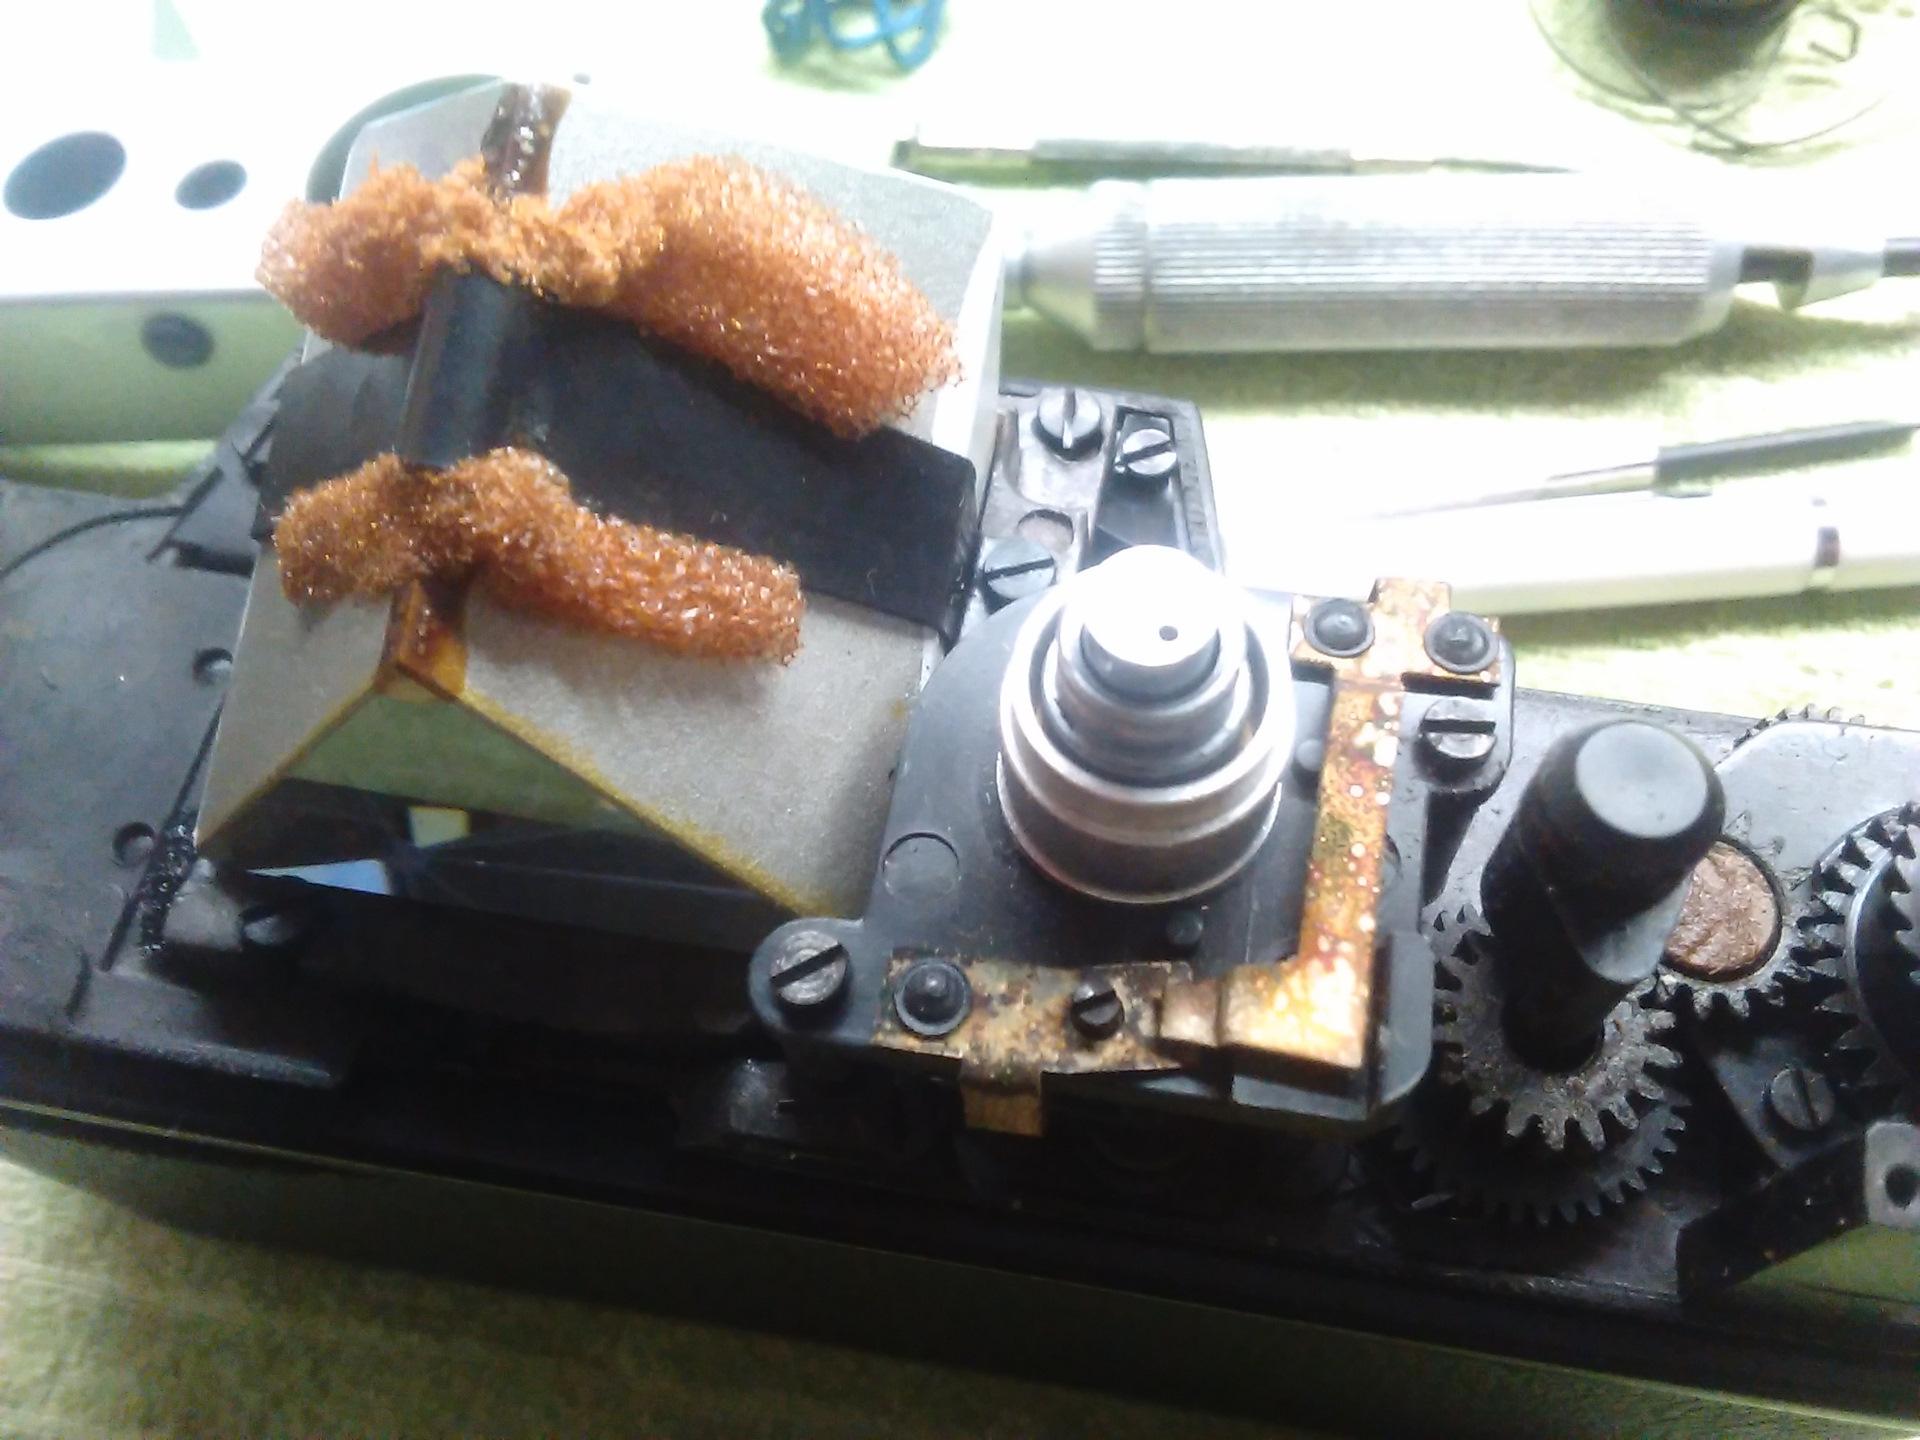 лондоне, ремонт фотоаппаратов зенит своими руками шахматисту